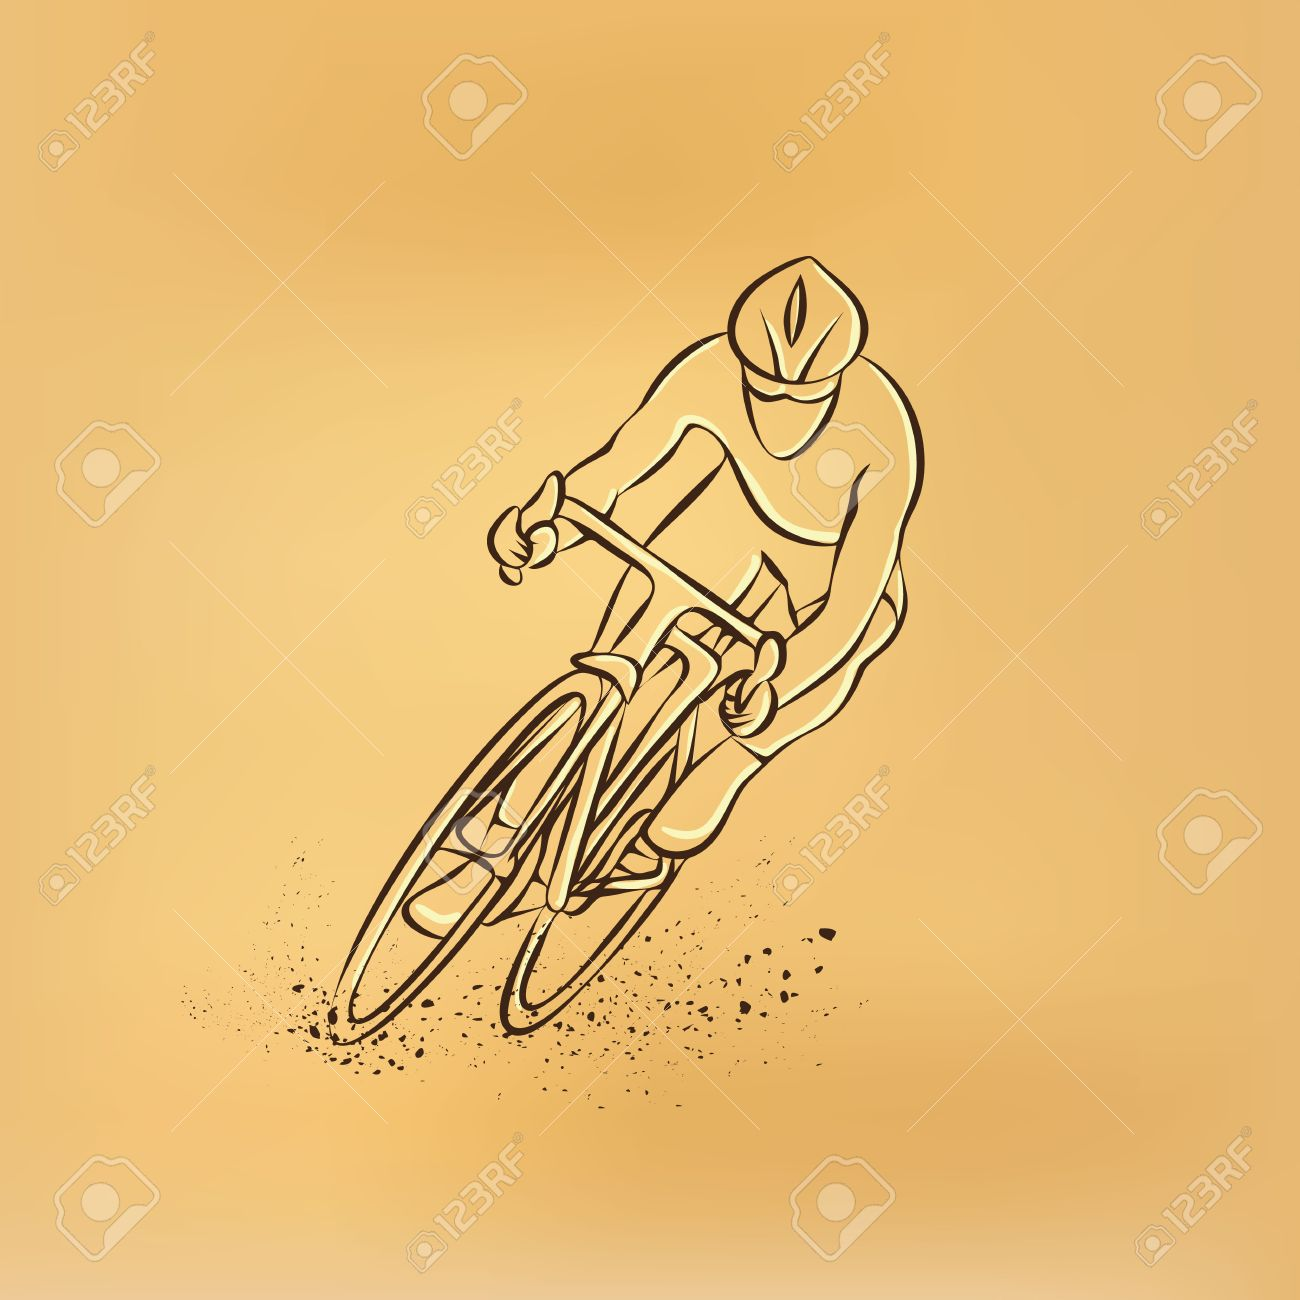 Vélo De Course Vue De Face Vector Retro Dessin Illustration